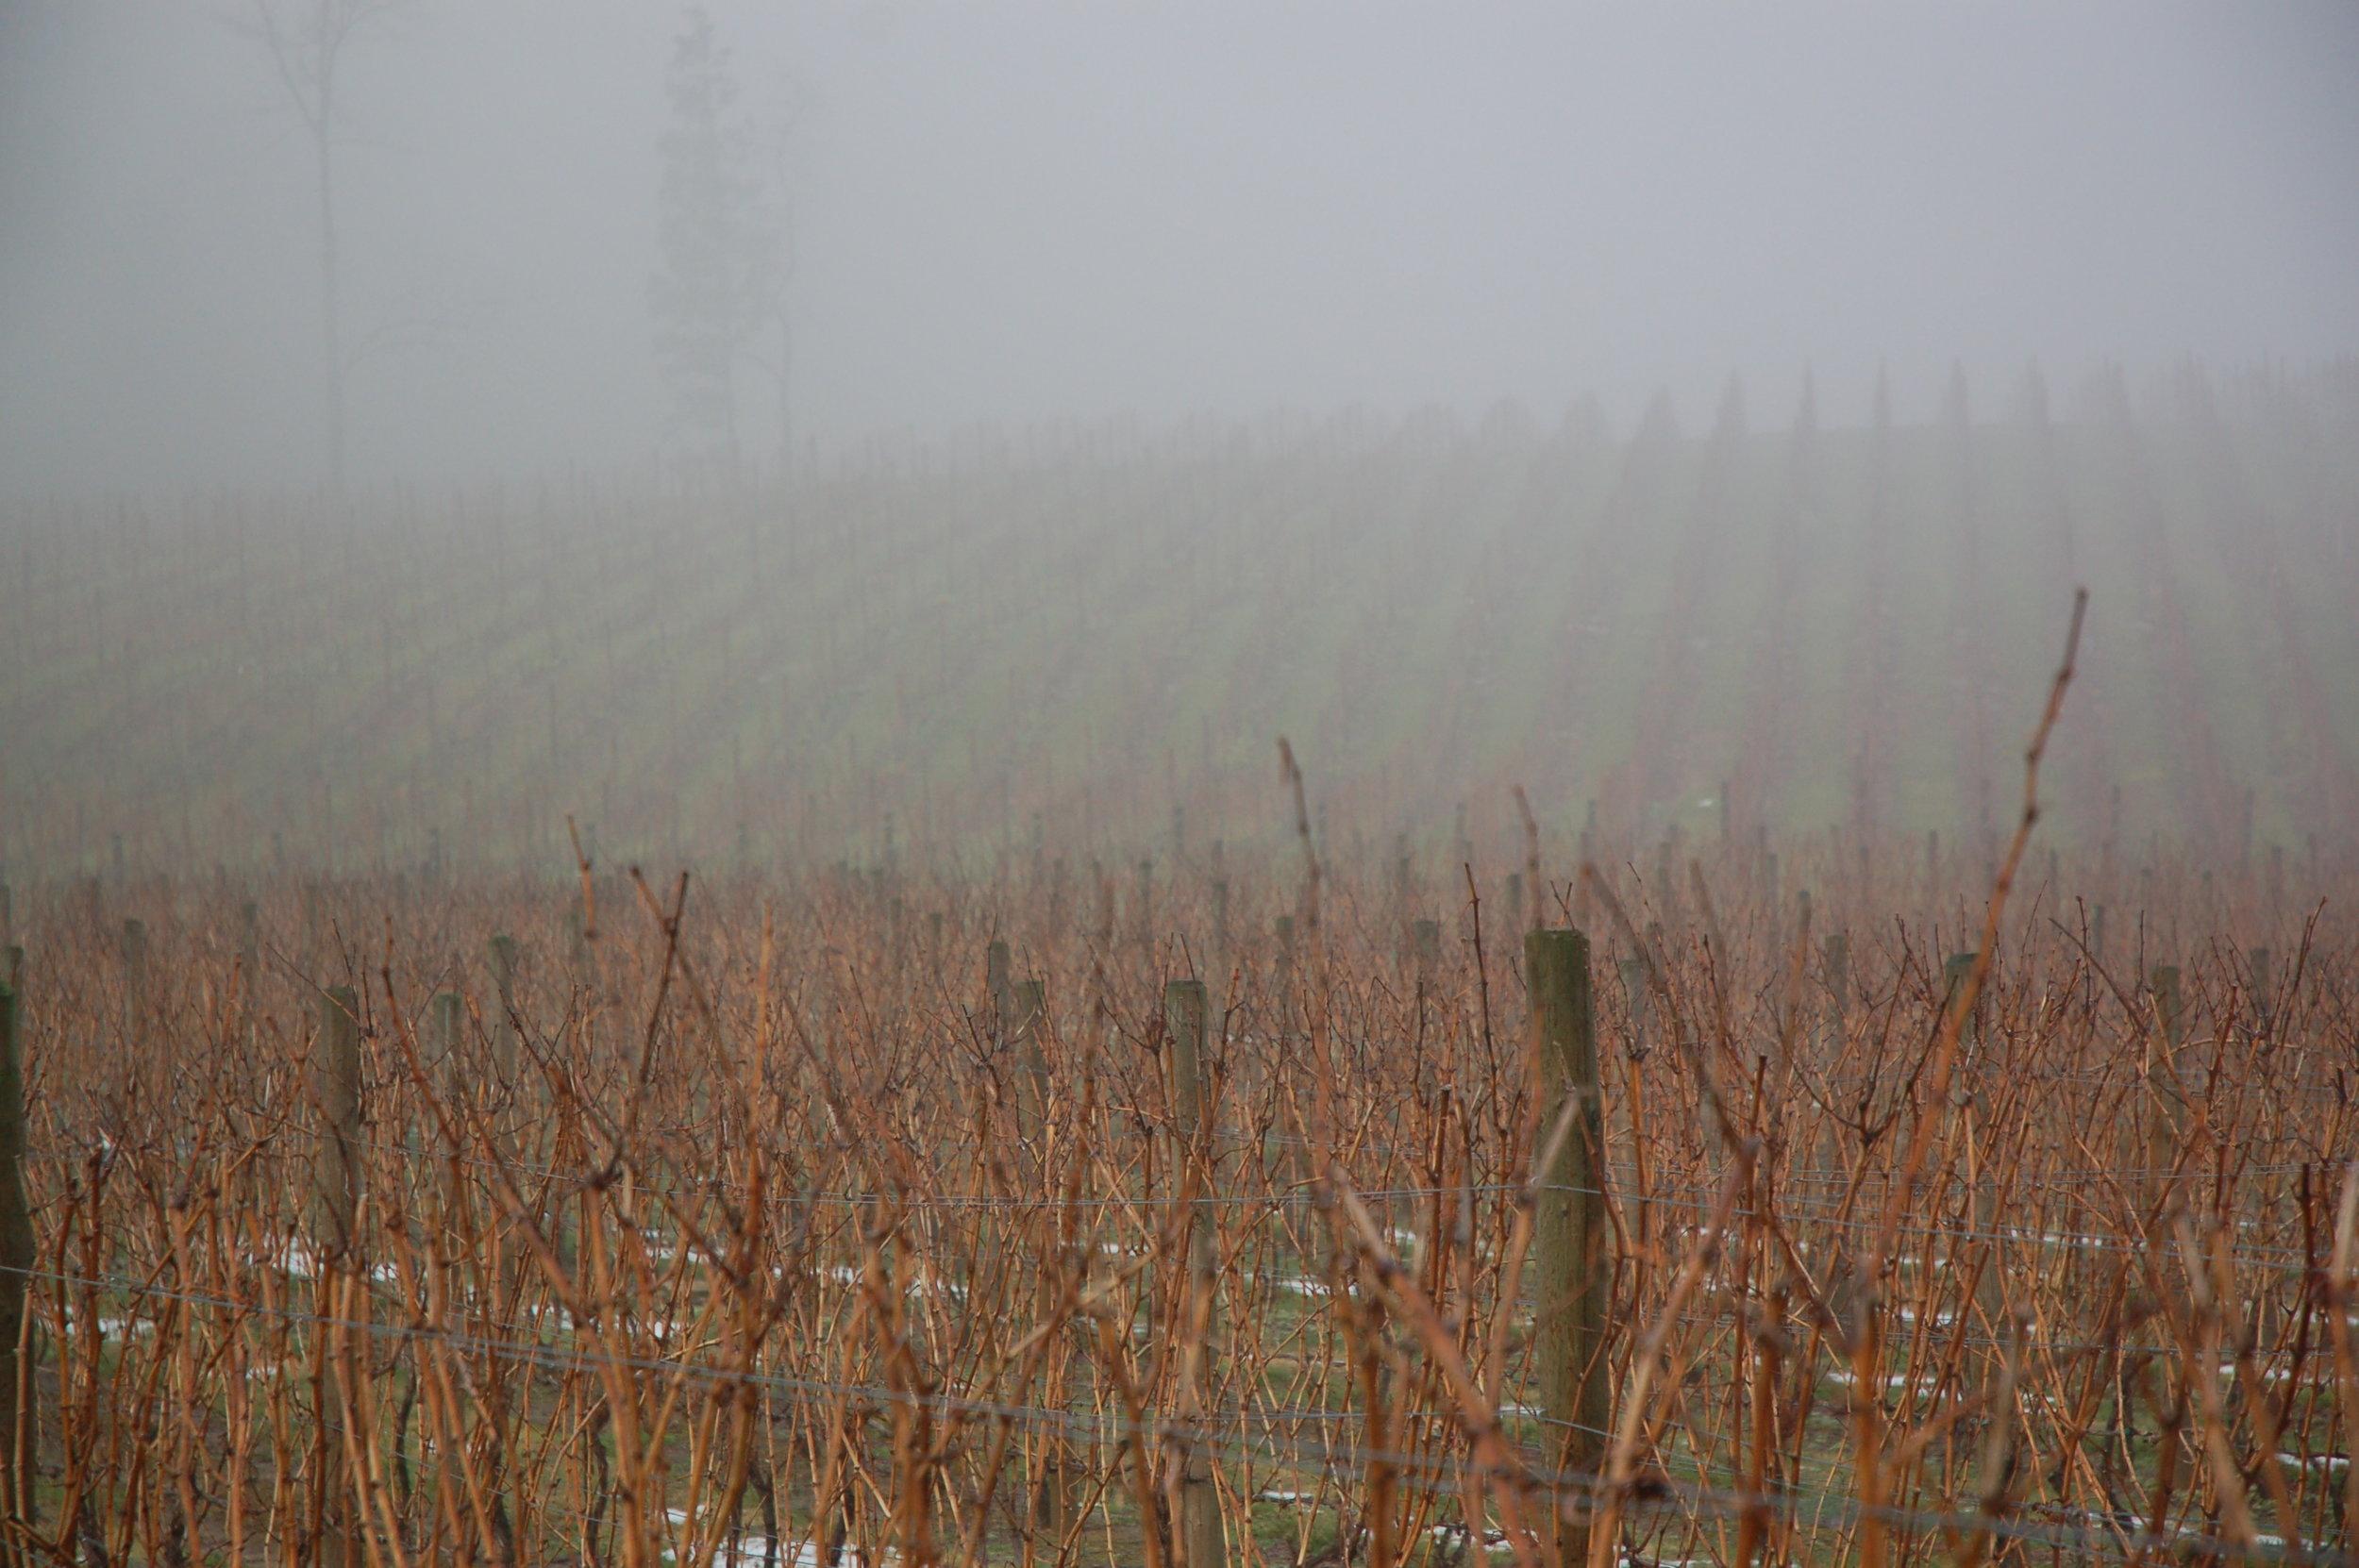 Alba Vineyard & Winery- Hillside Pinot Noir and Hillside Chardonnay